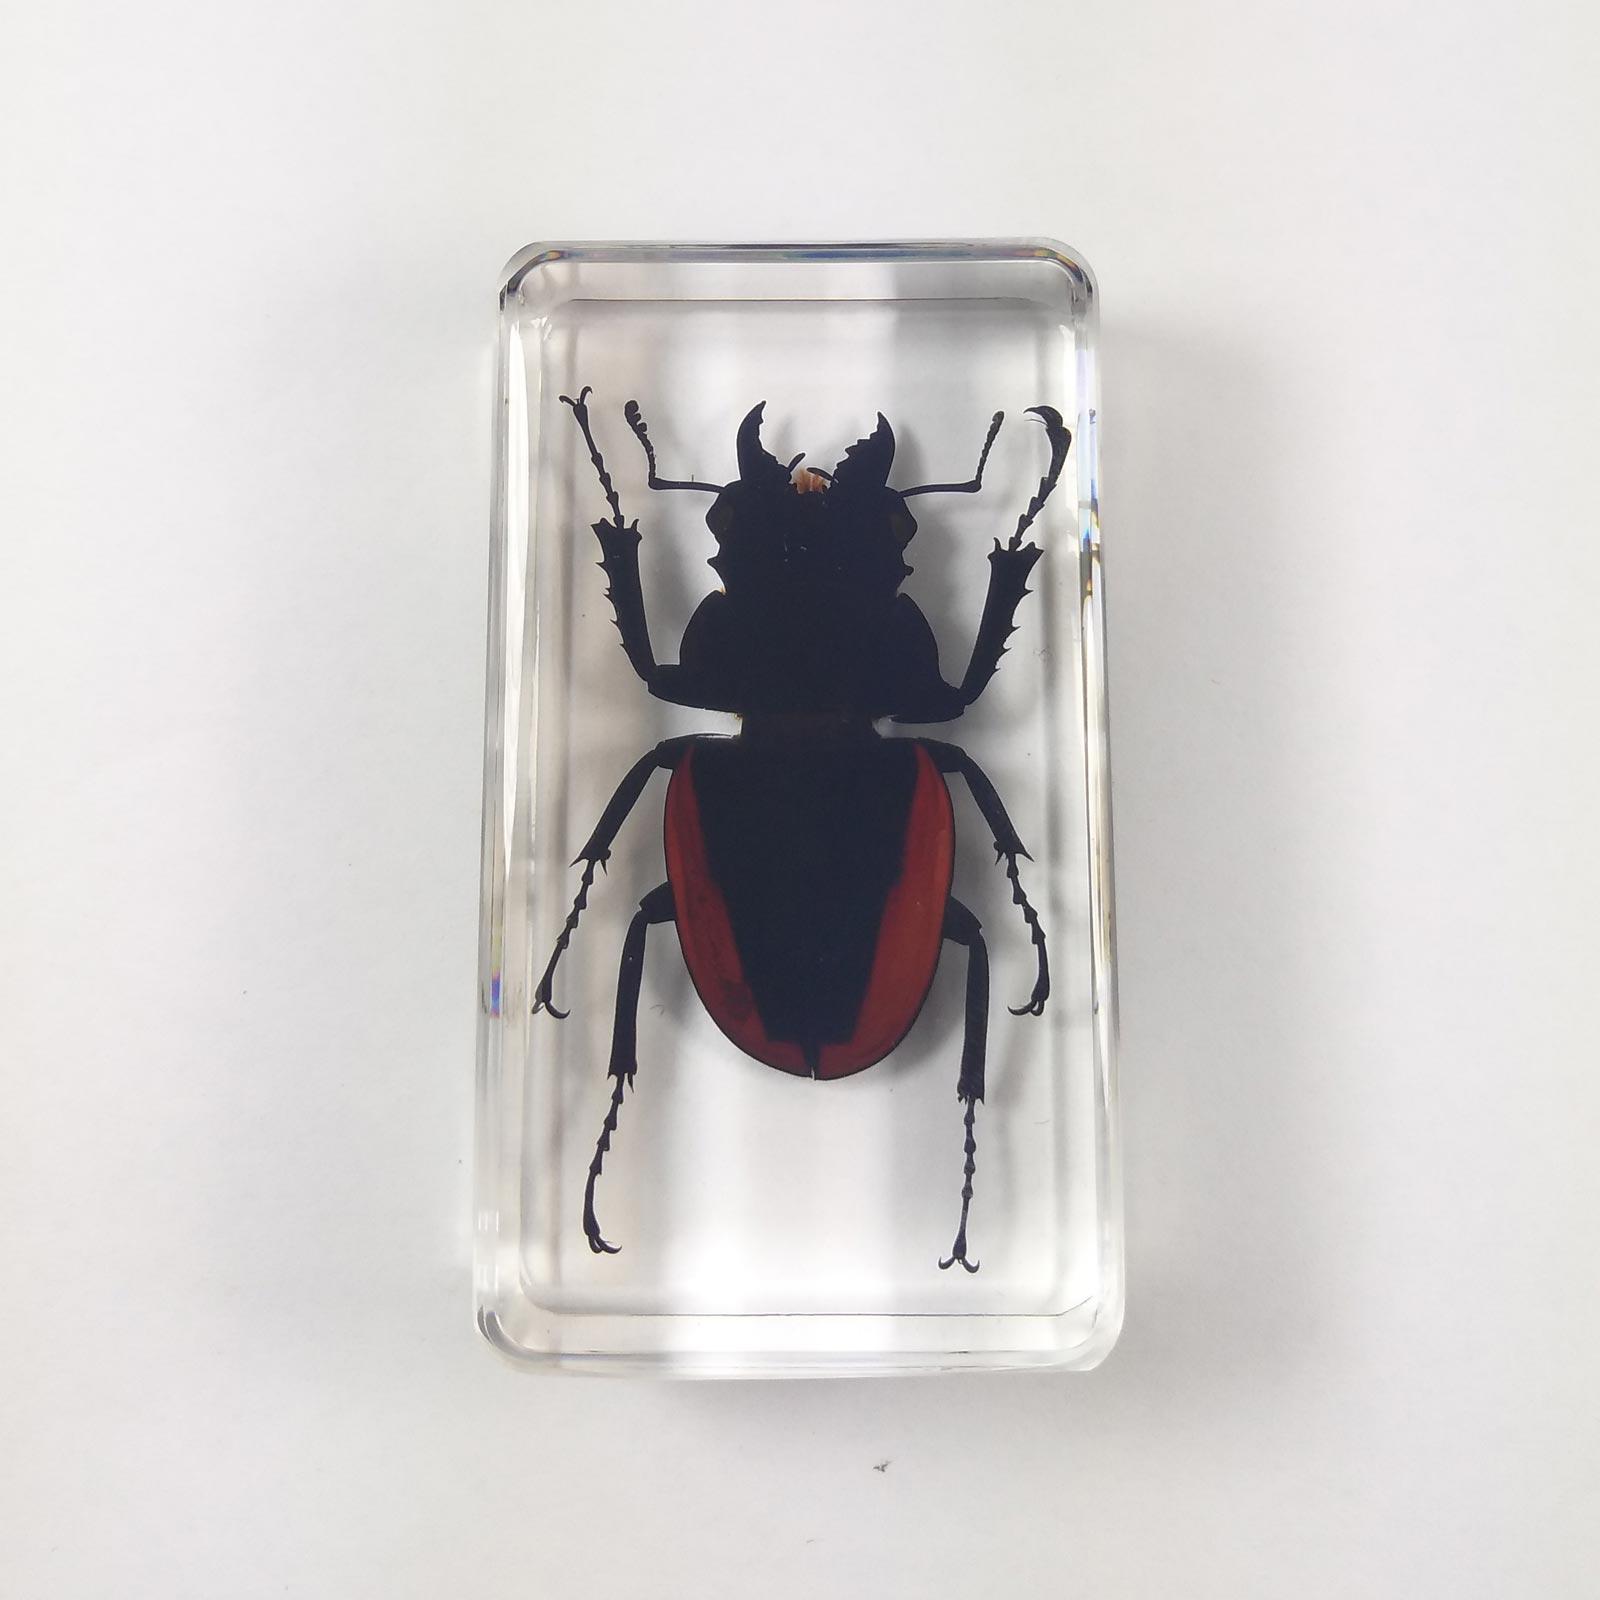 Real Insect Specimen Black Brown Stag Beetle Transparent Polymer Resin Display